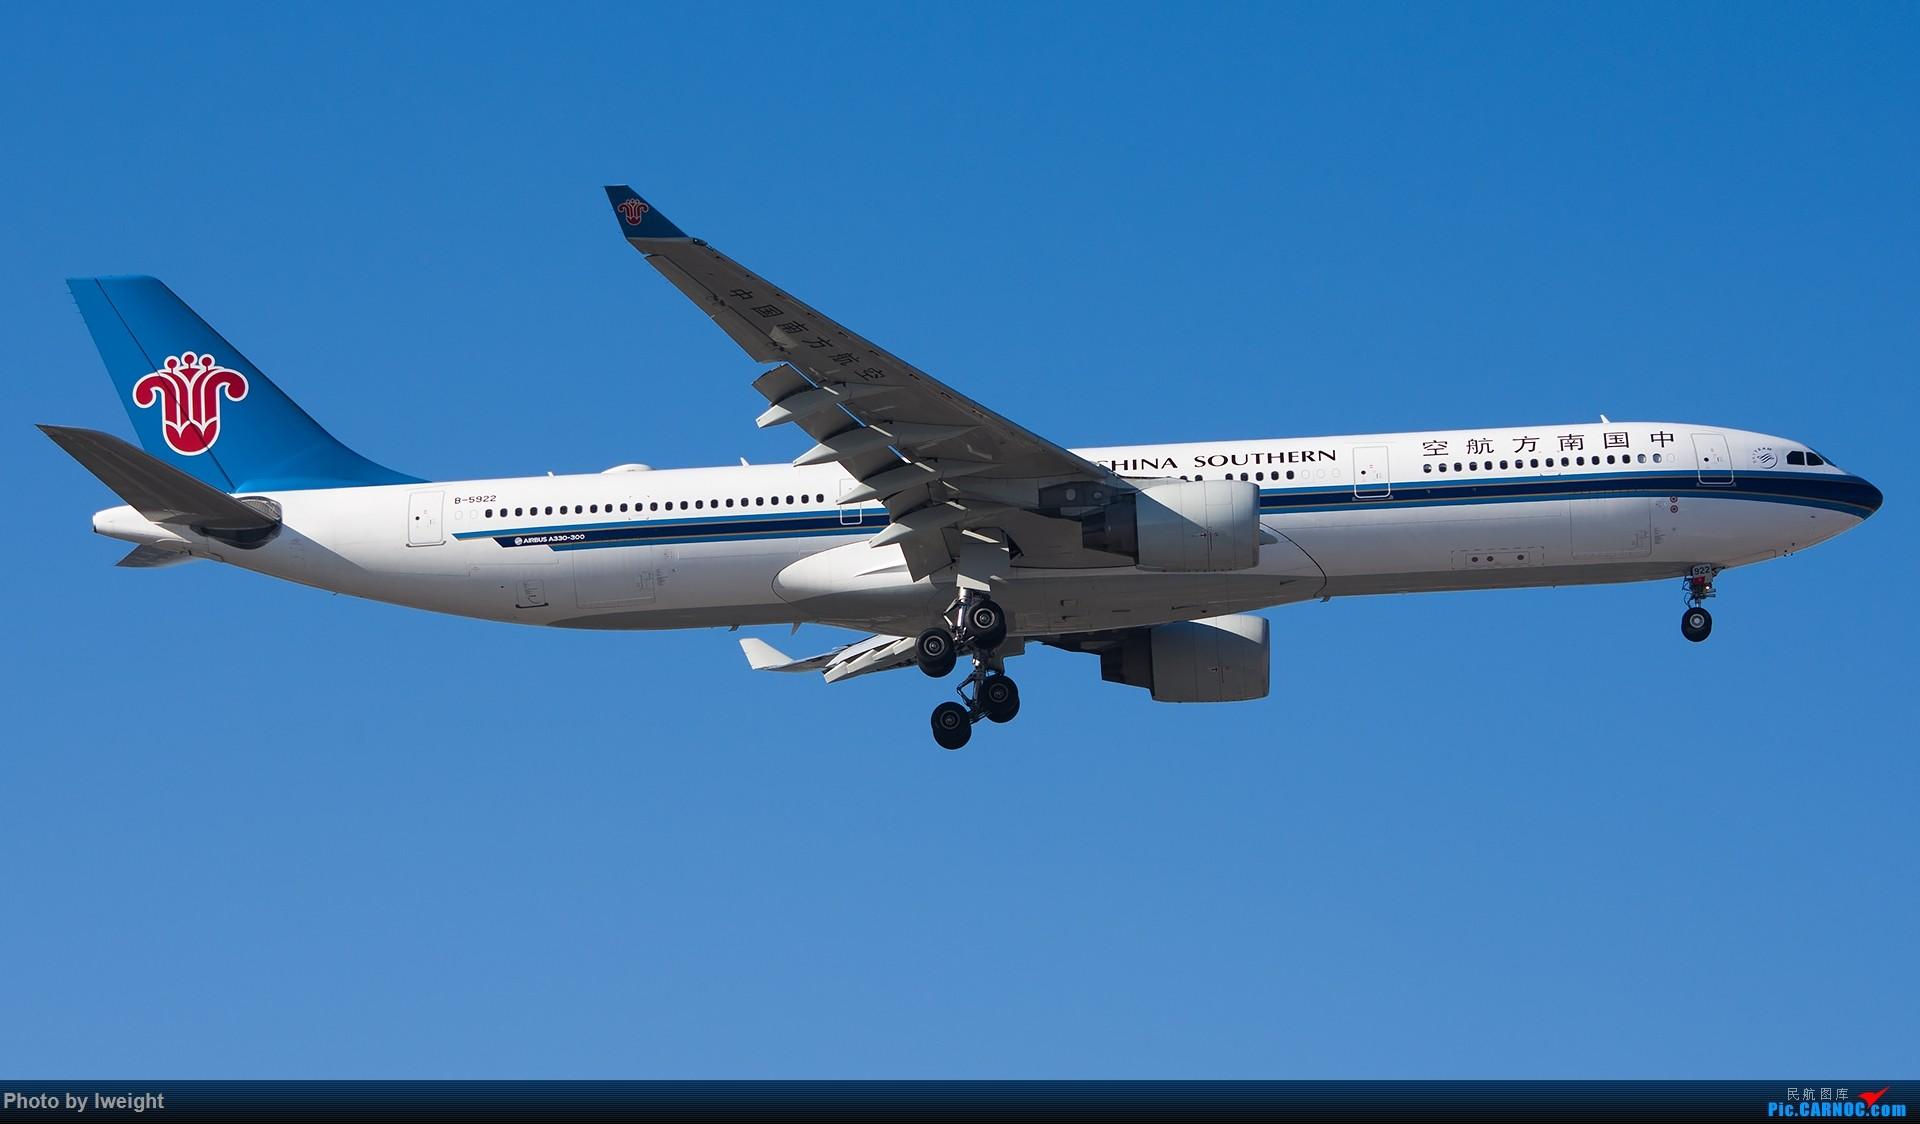 Re:[原创]终于在12月的北京等到了一个晴天的周末,出来拍拍飞机【2015-12-5】 AIRBUS A330-300 B-5922 中国北京首都国际机场